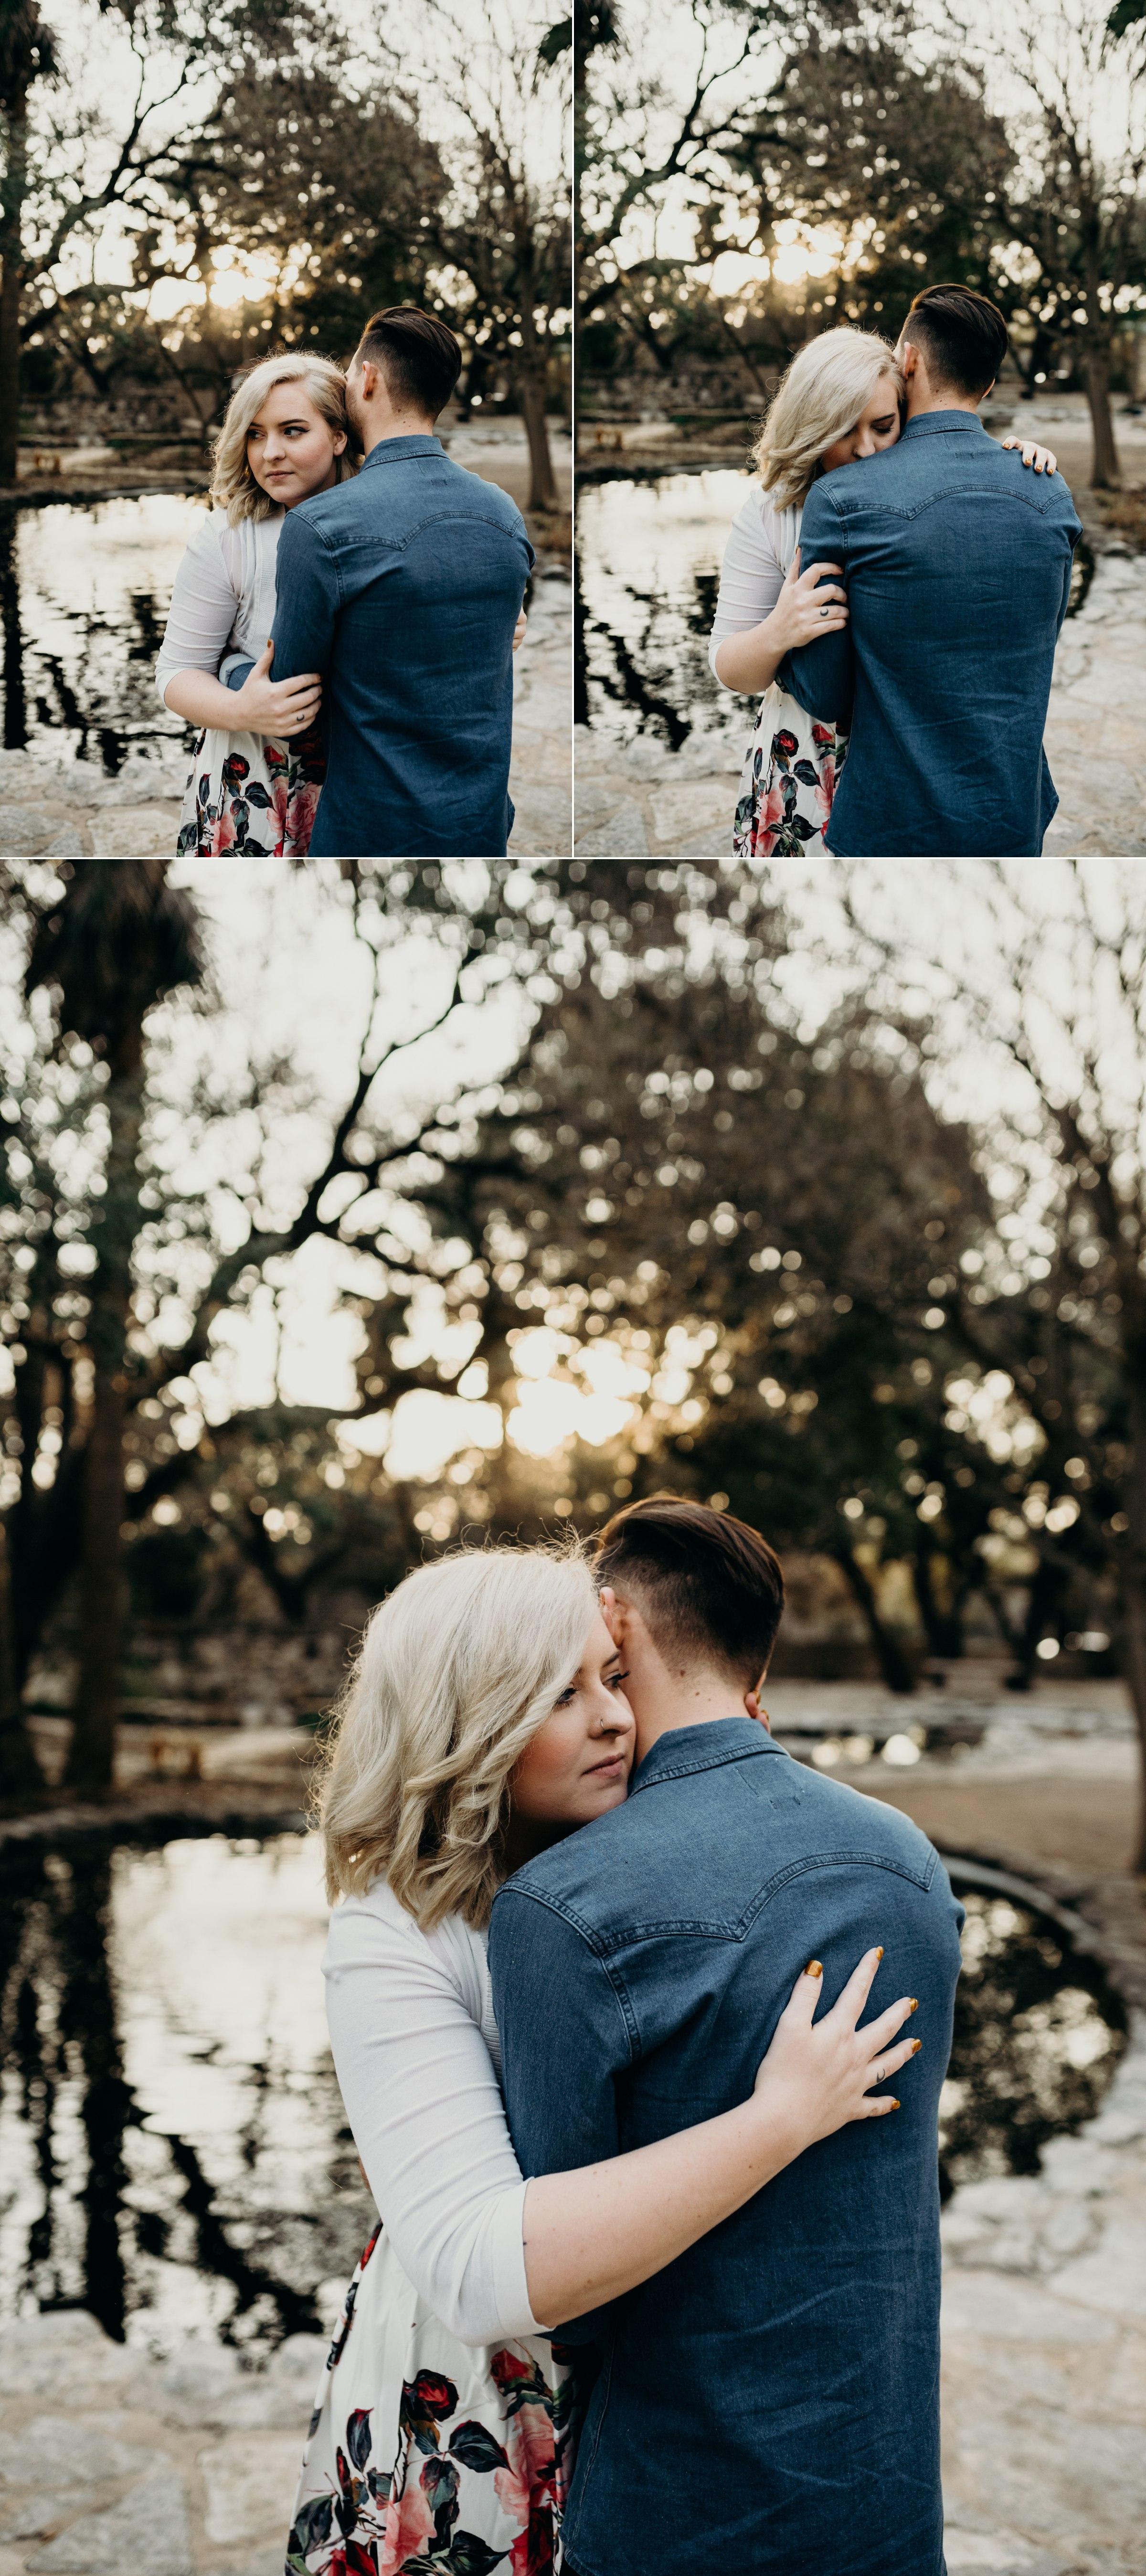 drew-andrew-texas-austin-minnesota-minneapolis-wedding-photographer-destination-elopement-intimate-adventurous_0115.jpg